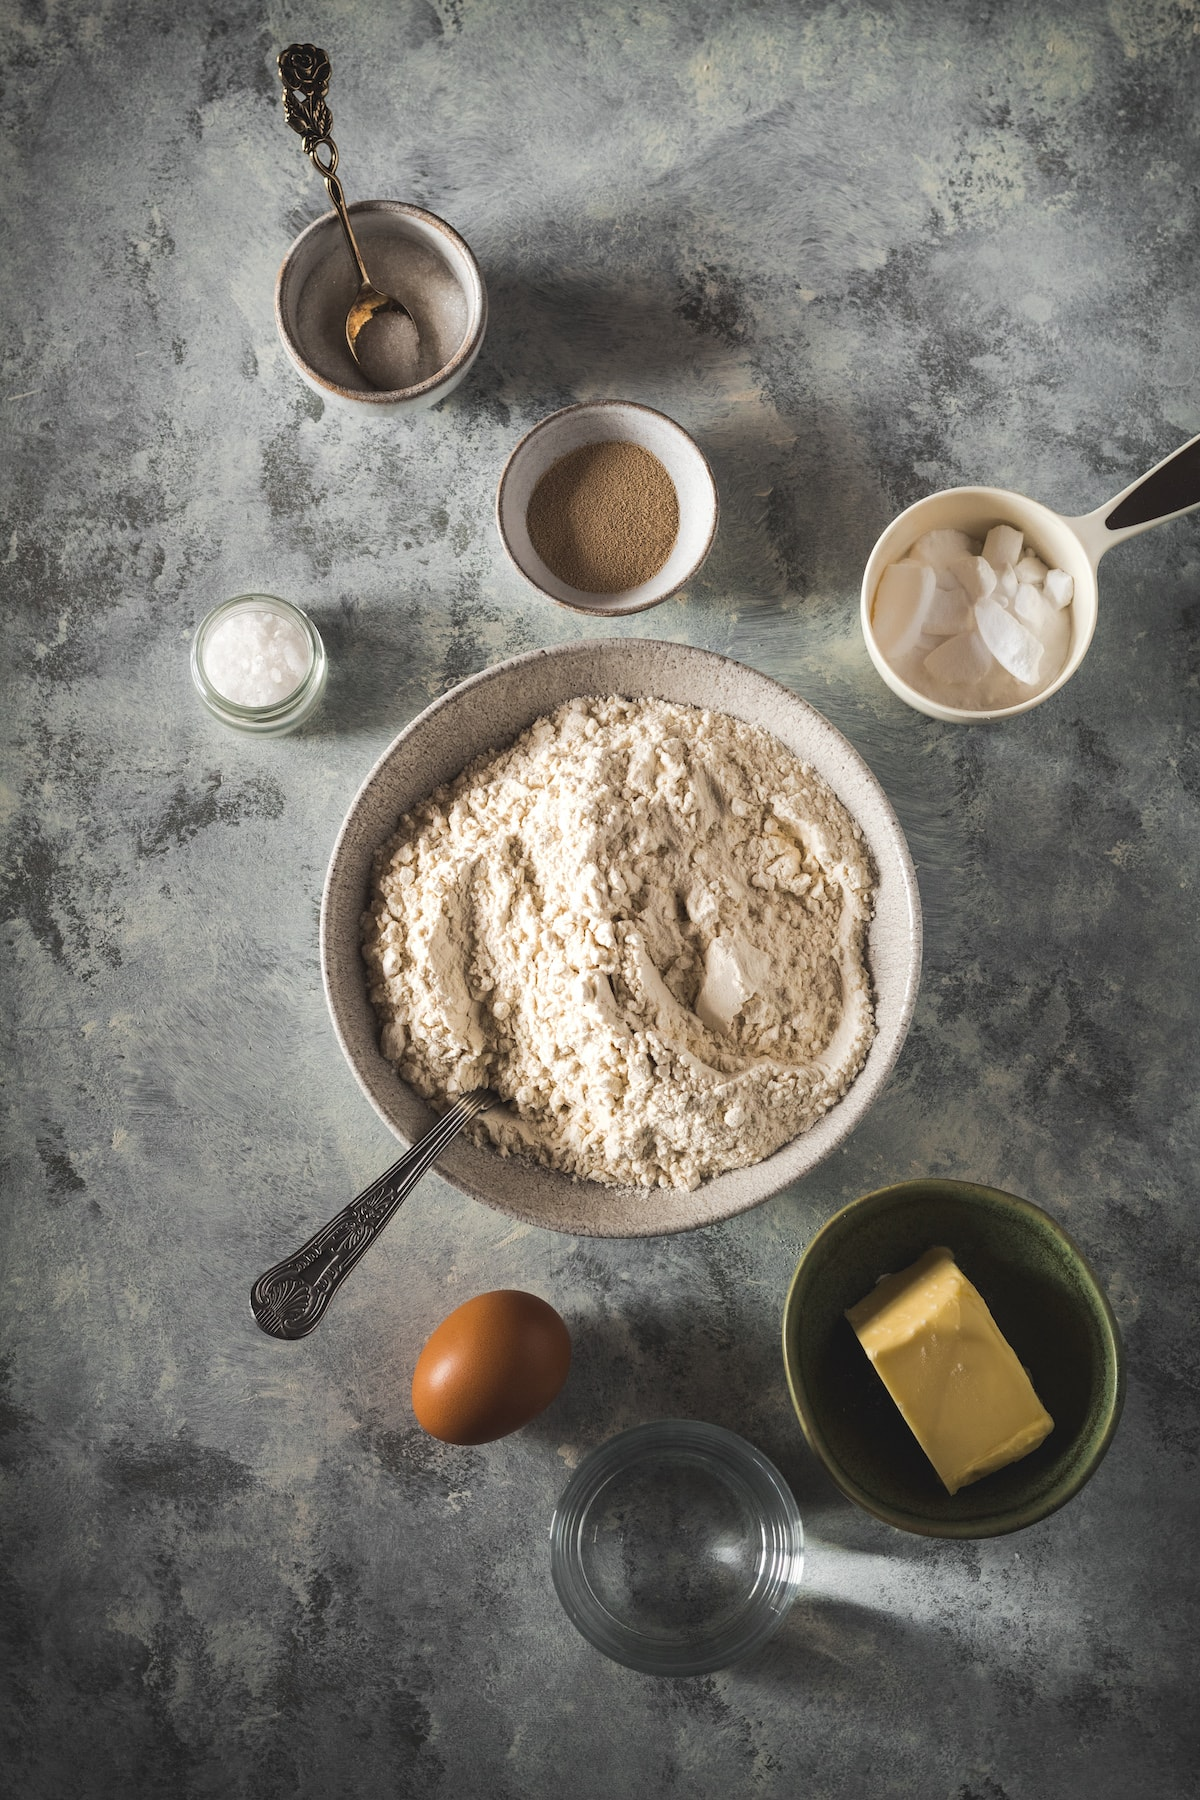 Ingredients for homemade soft pretzels.